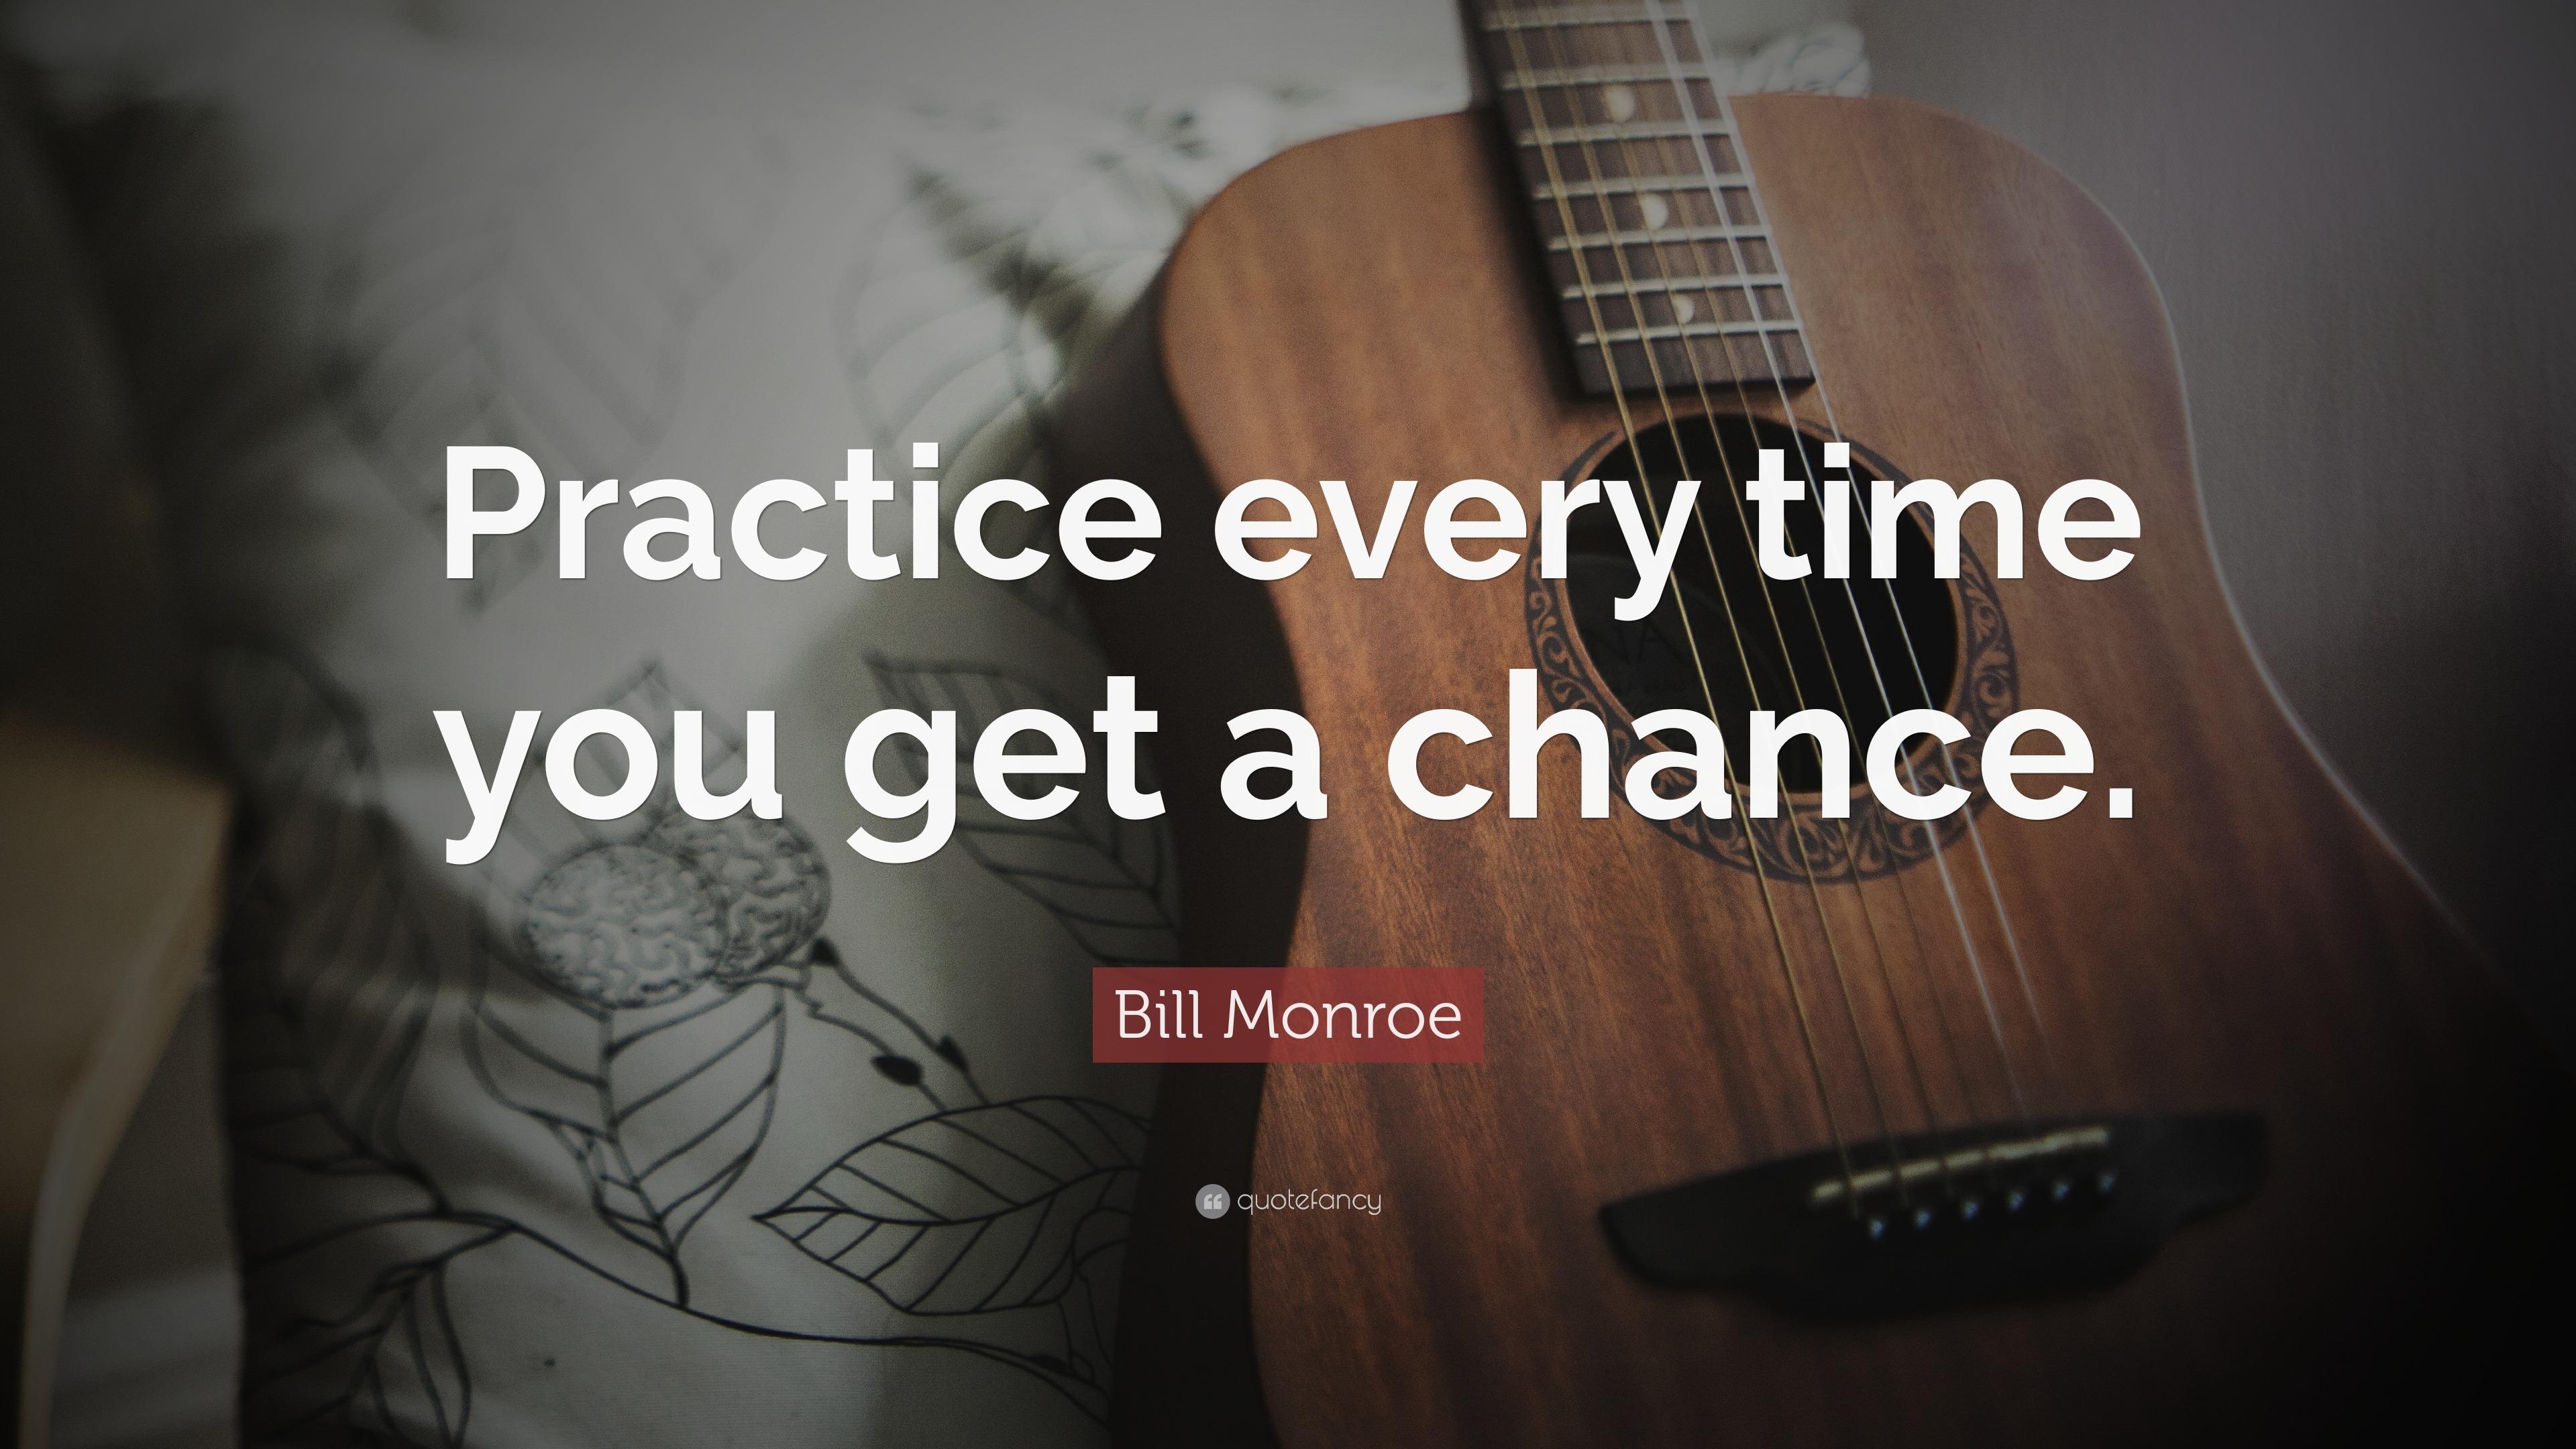 Practice Quotes Practice Quotes (40 wallpapers)   Quotefancy Practice Quotes